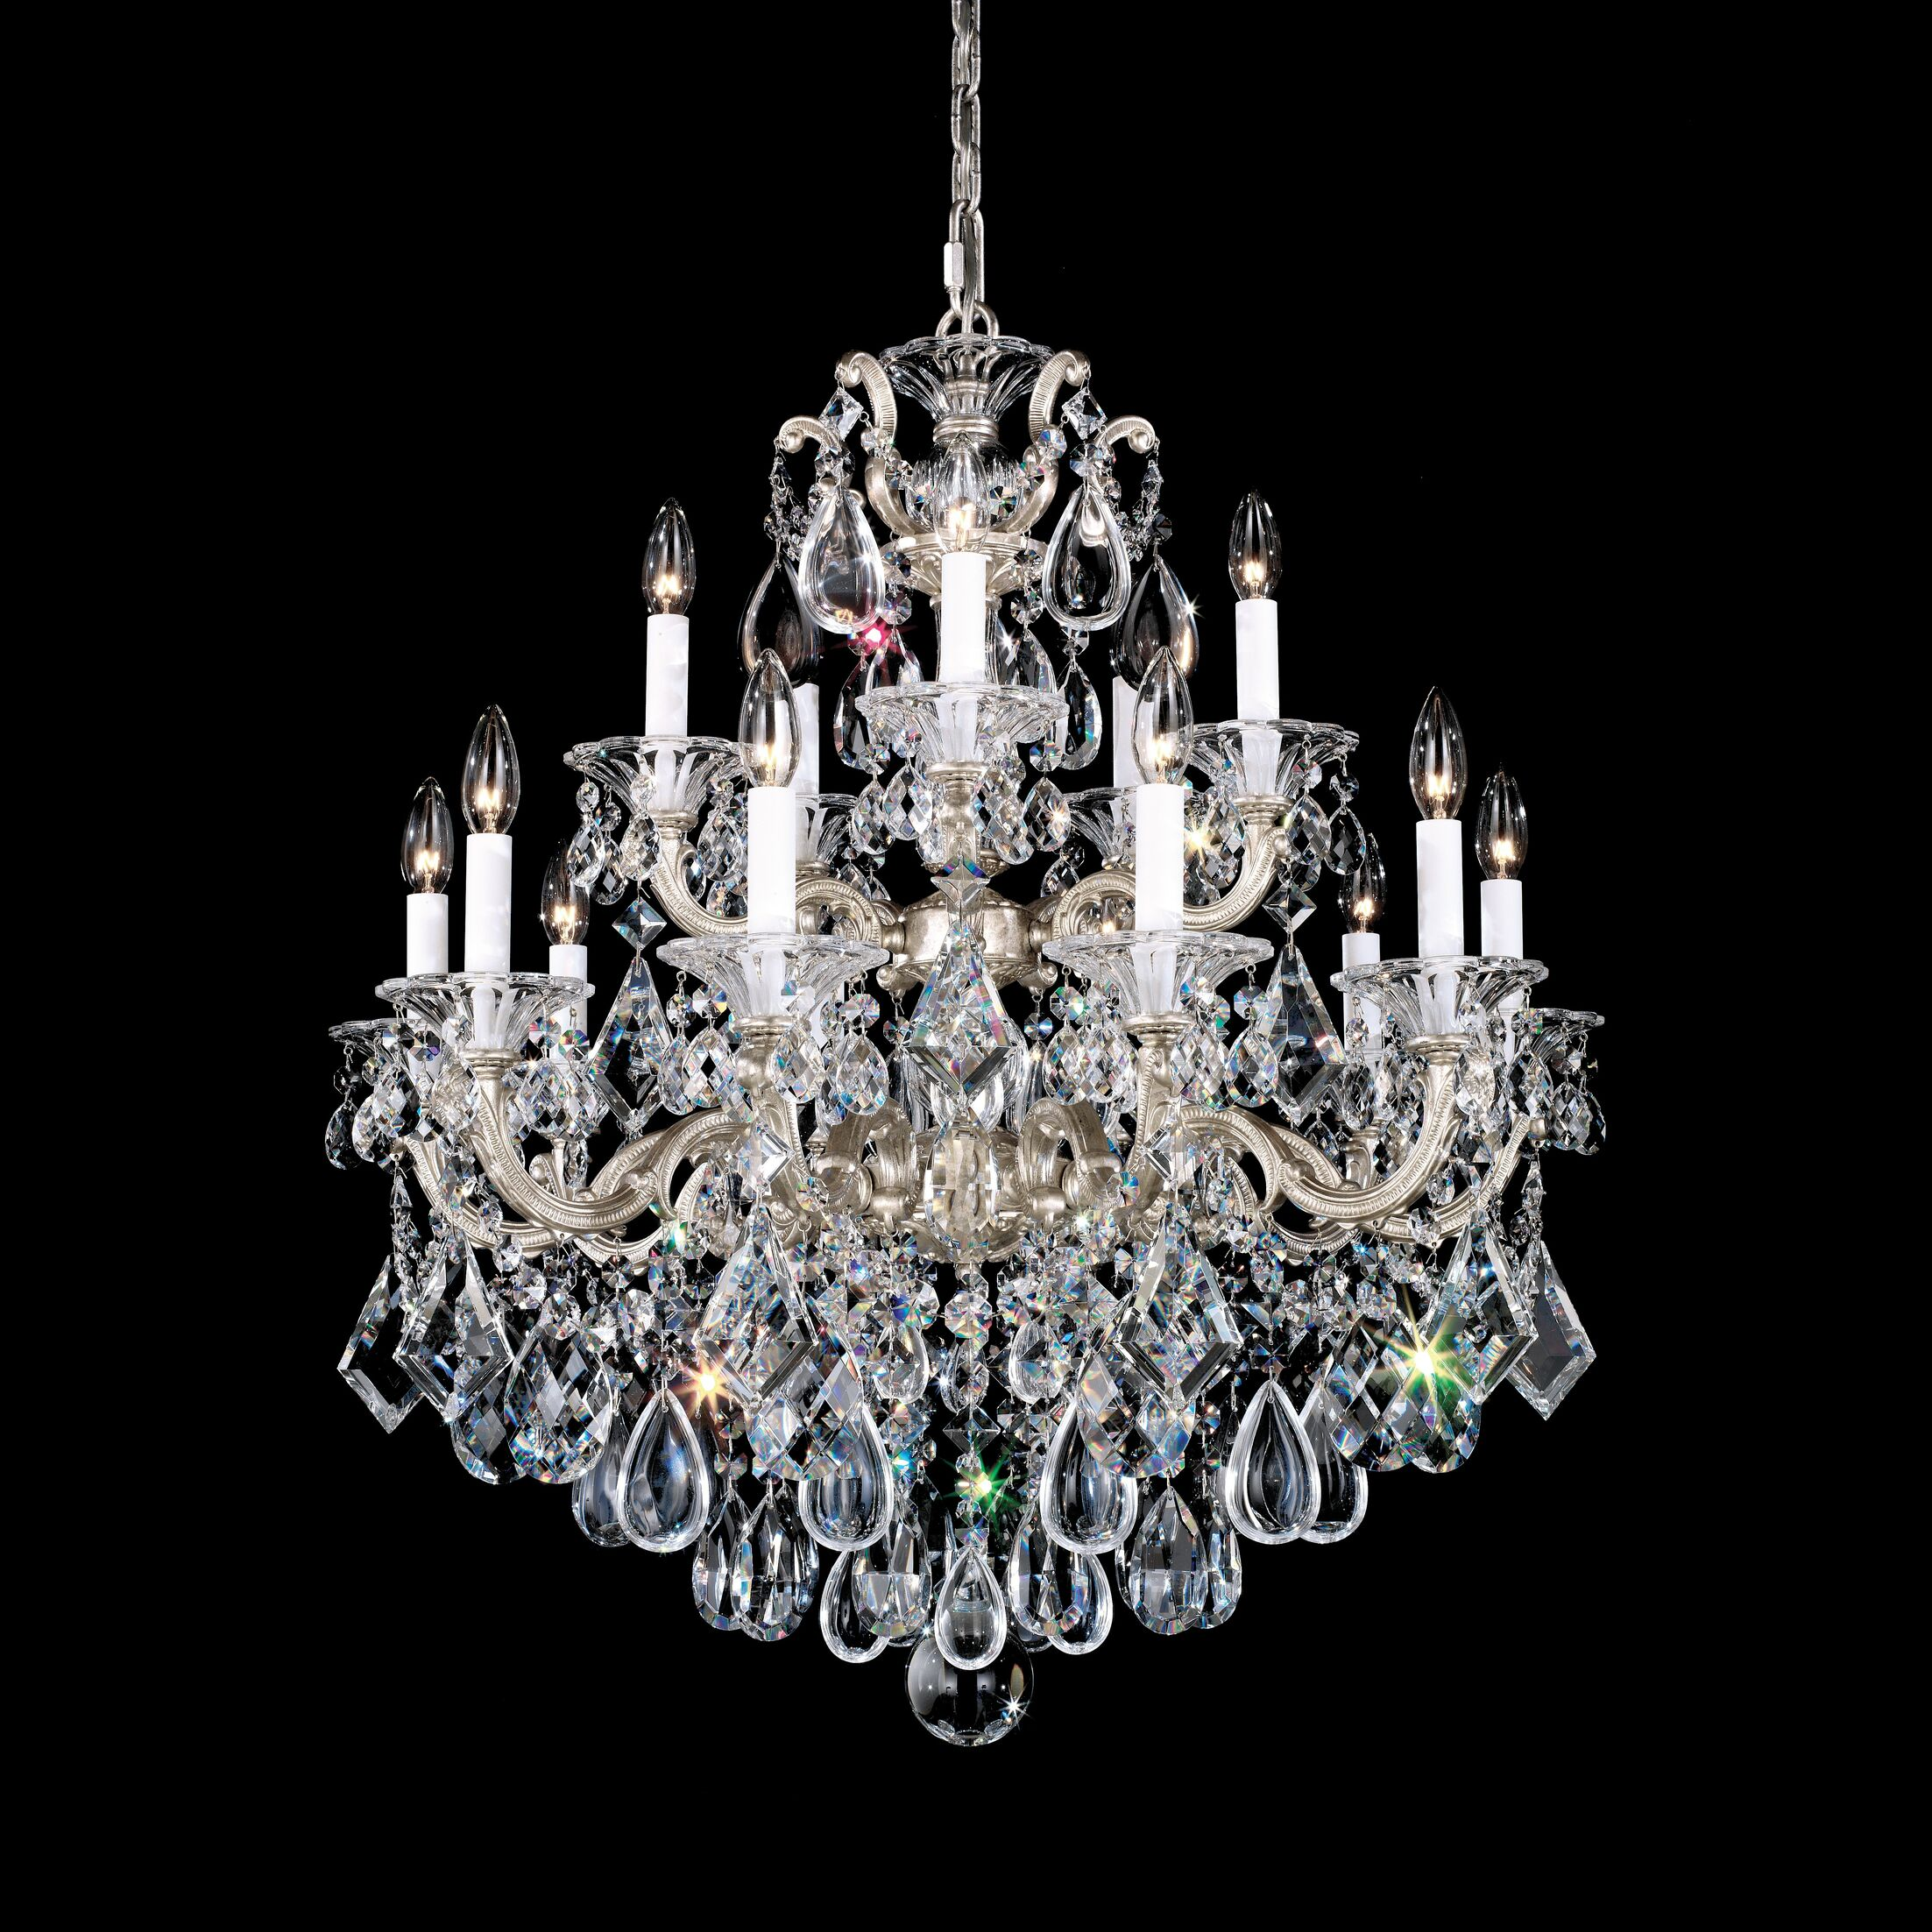 La Scala 15-Light Chandelier Finish / Crystal Color: Parchment Gold / Handcut Clear